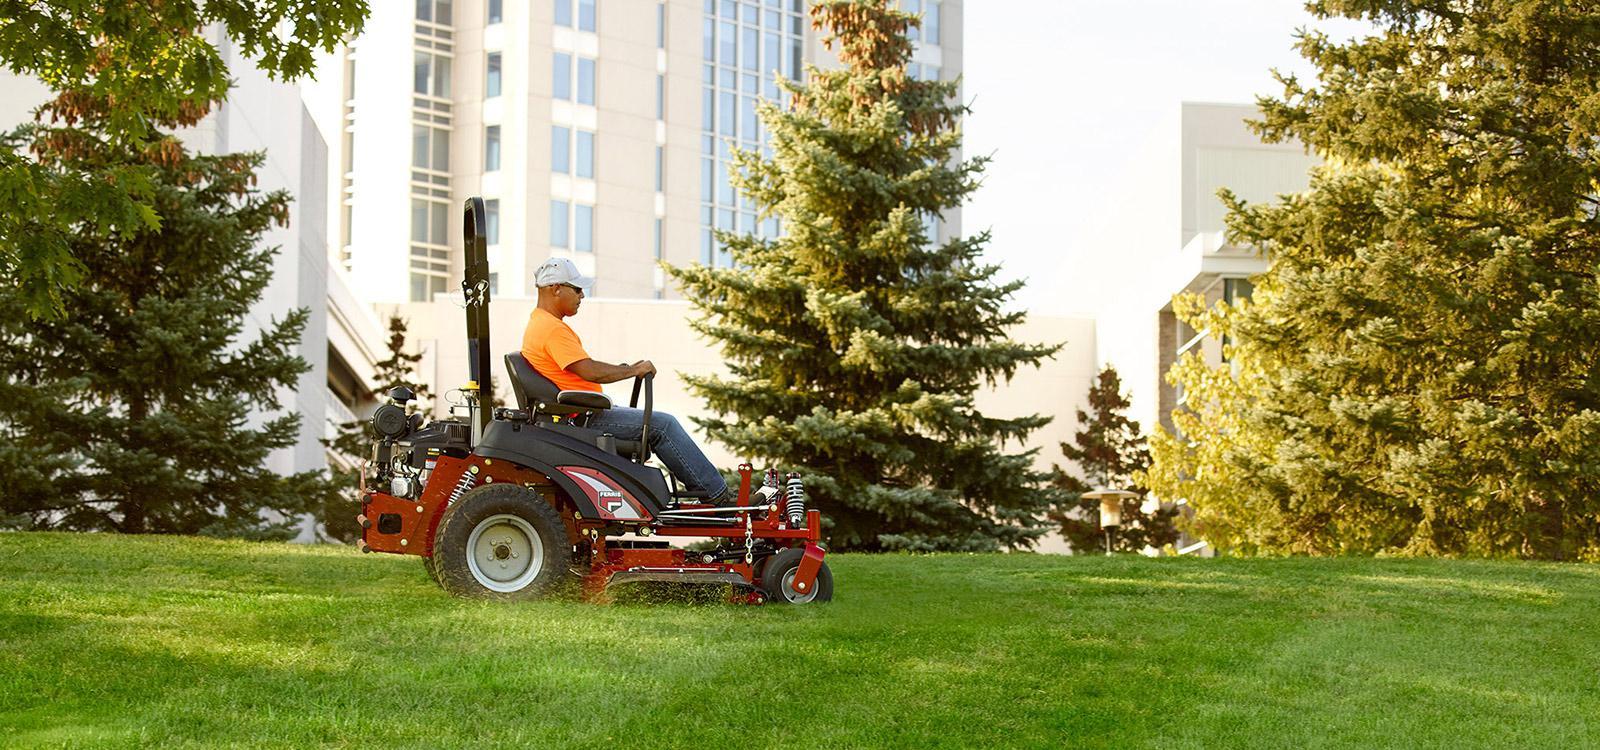 Ferris Lawn Mowers Midstate Turf & Tractor, LLC Springfield